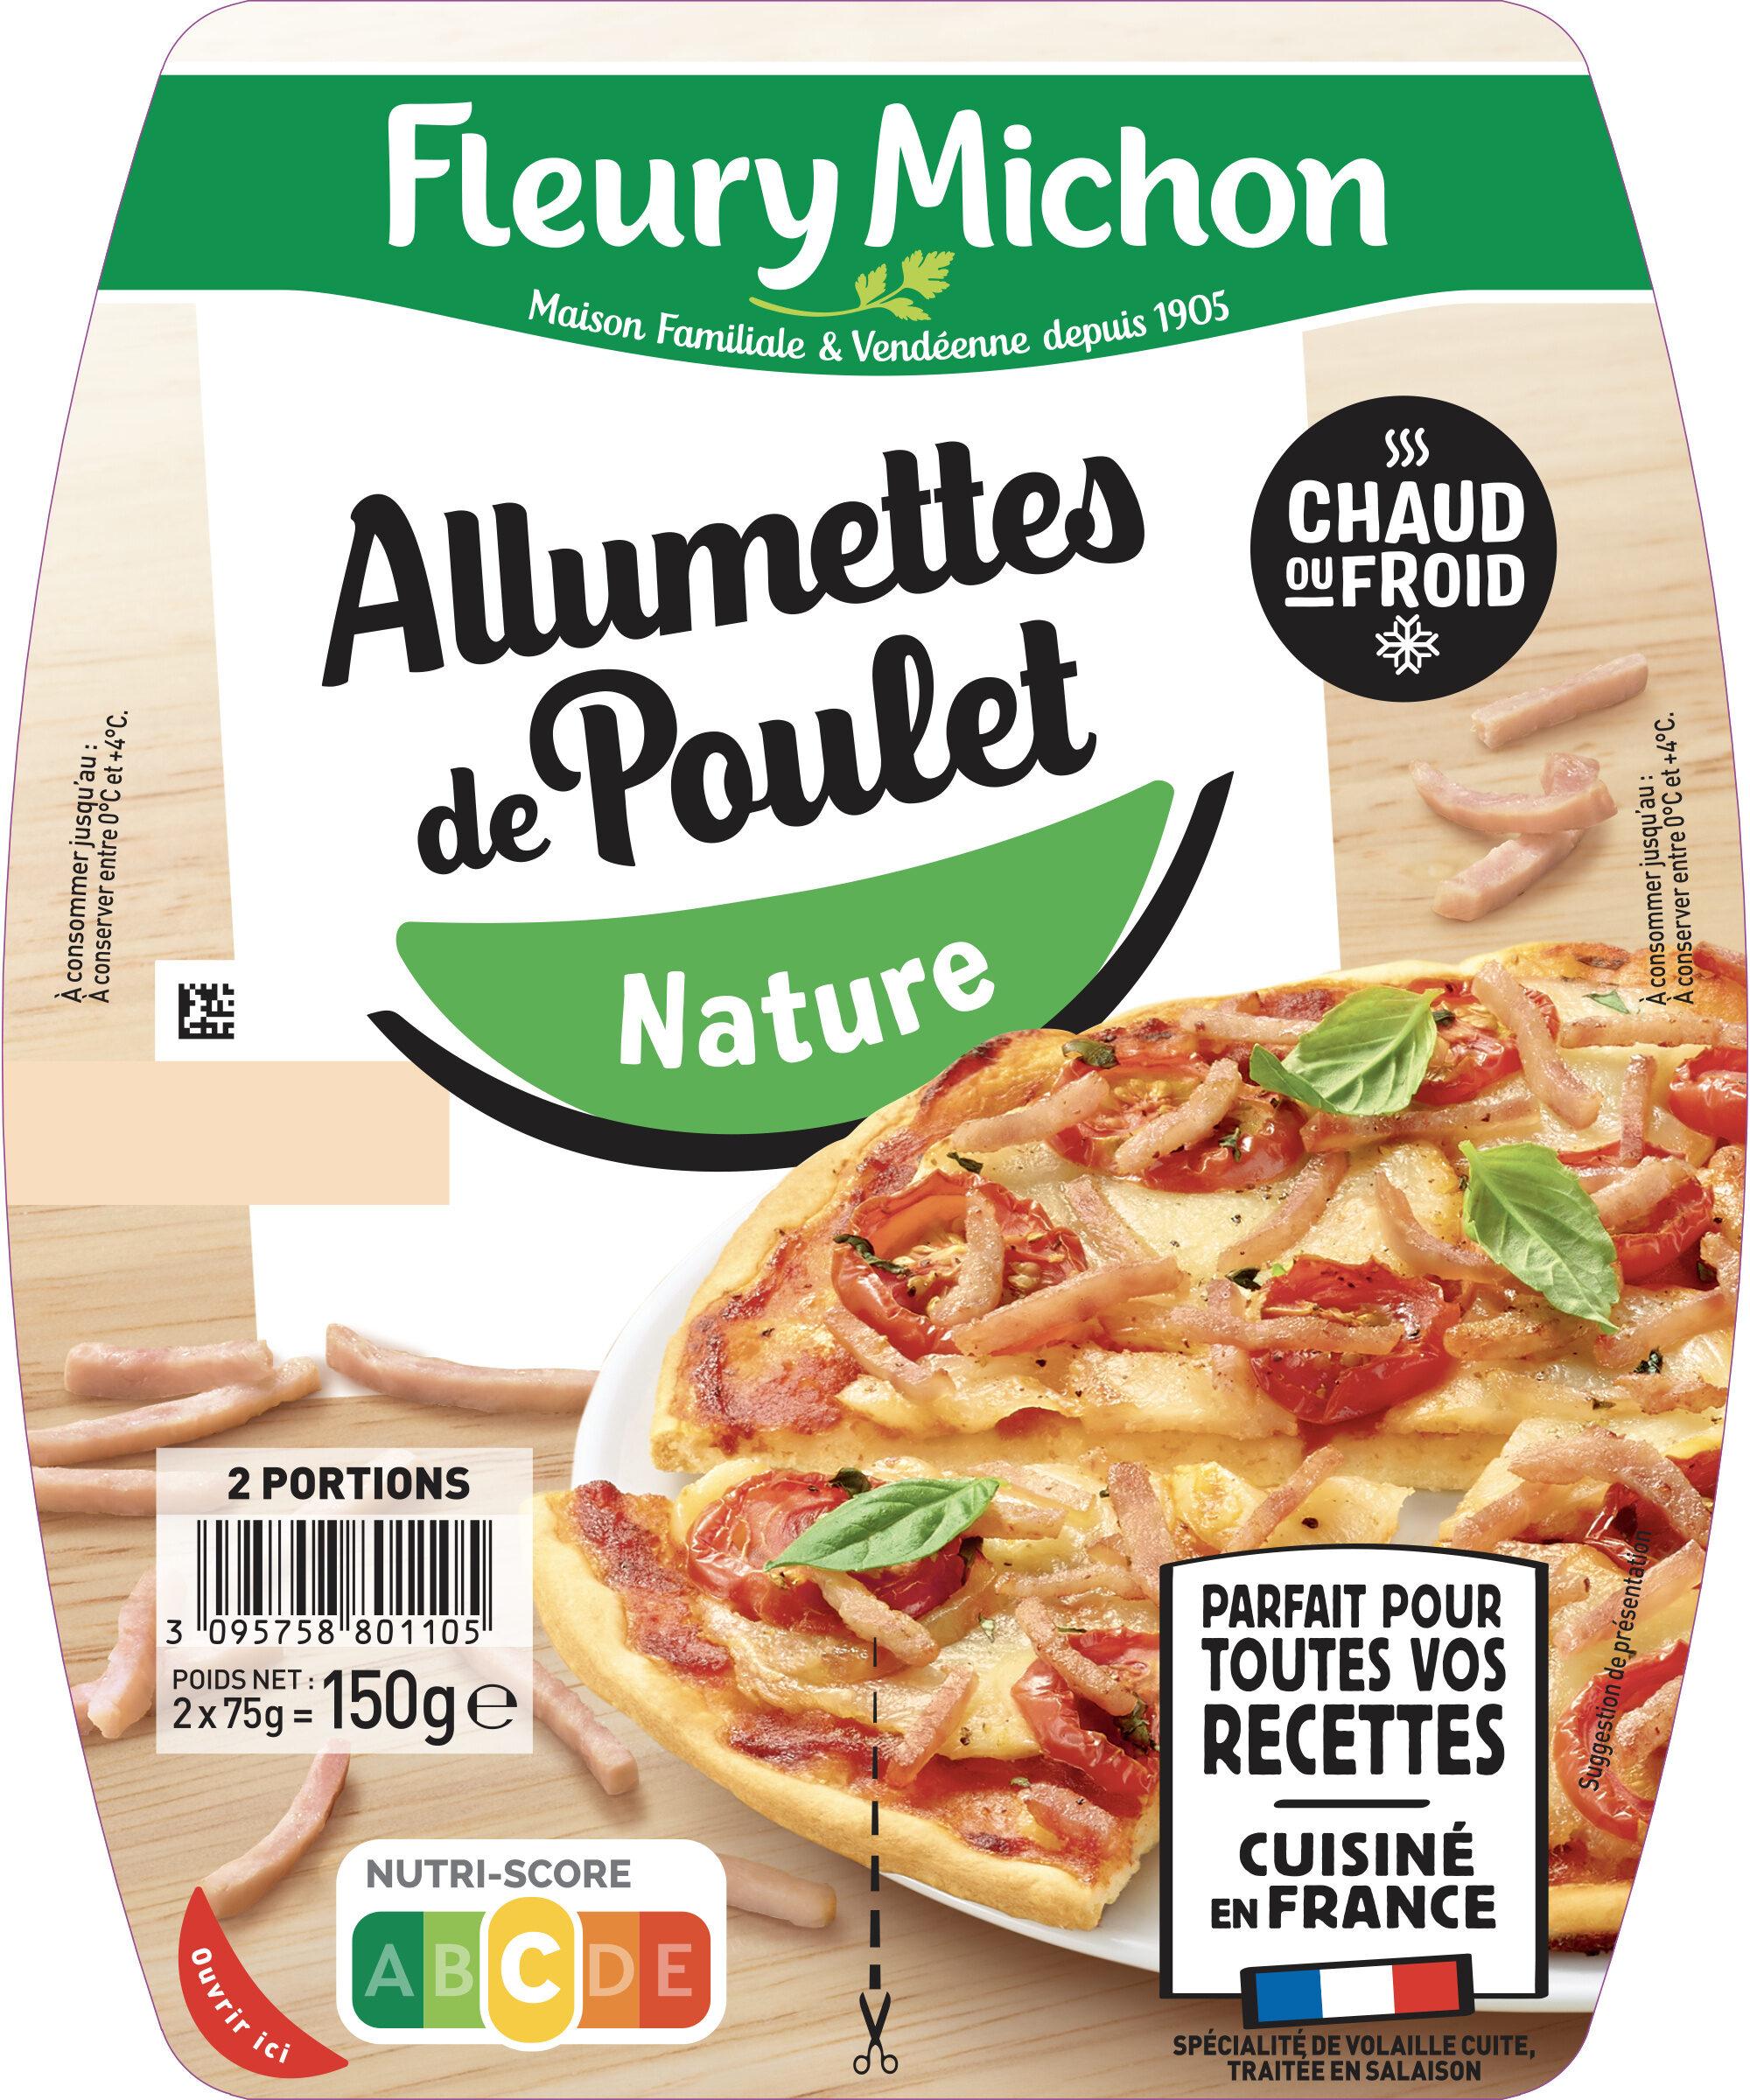 Allumettes de poulet nature - Prodotto - fr